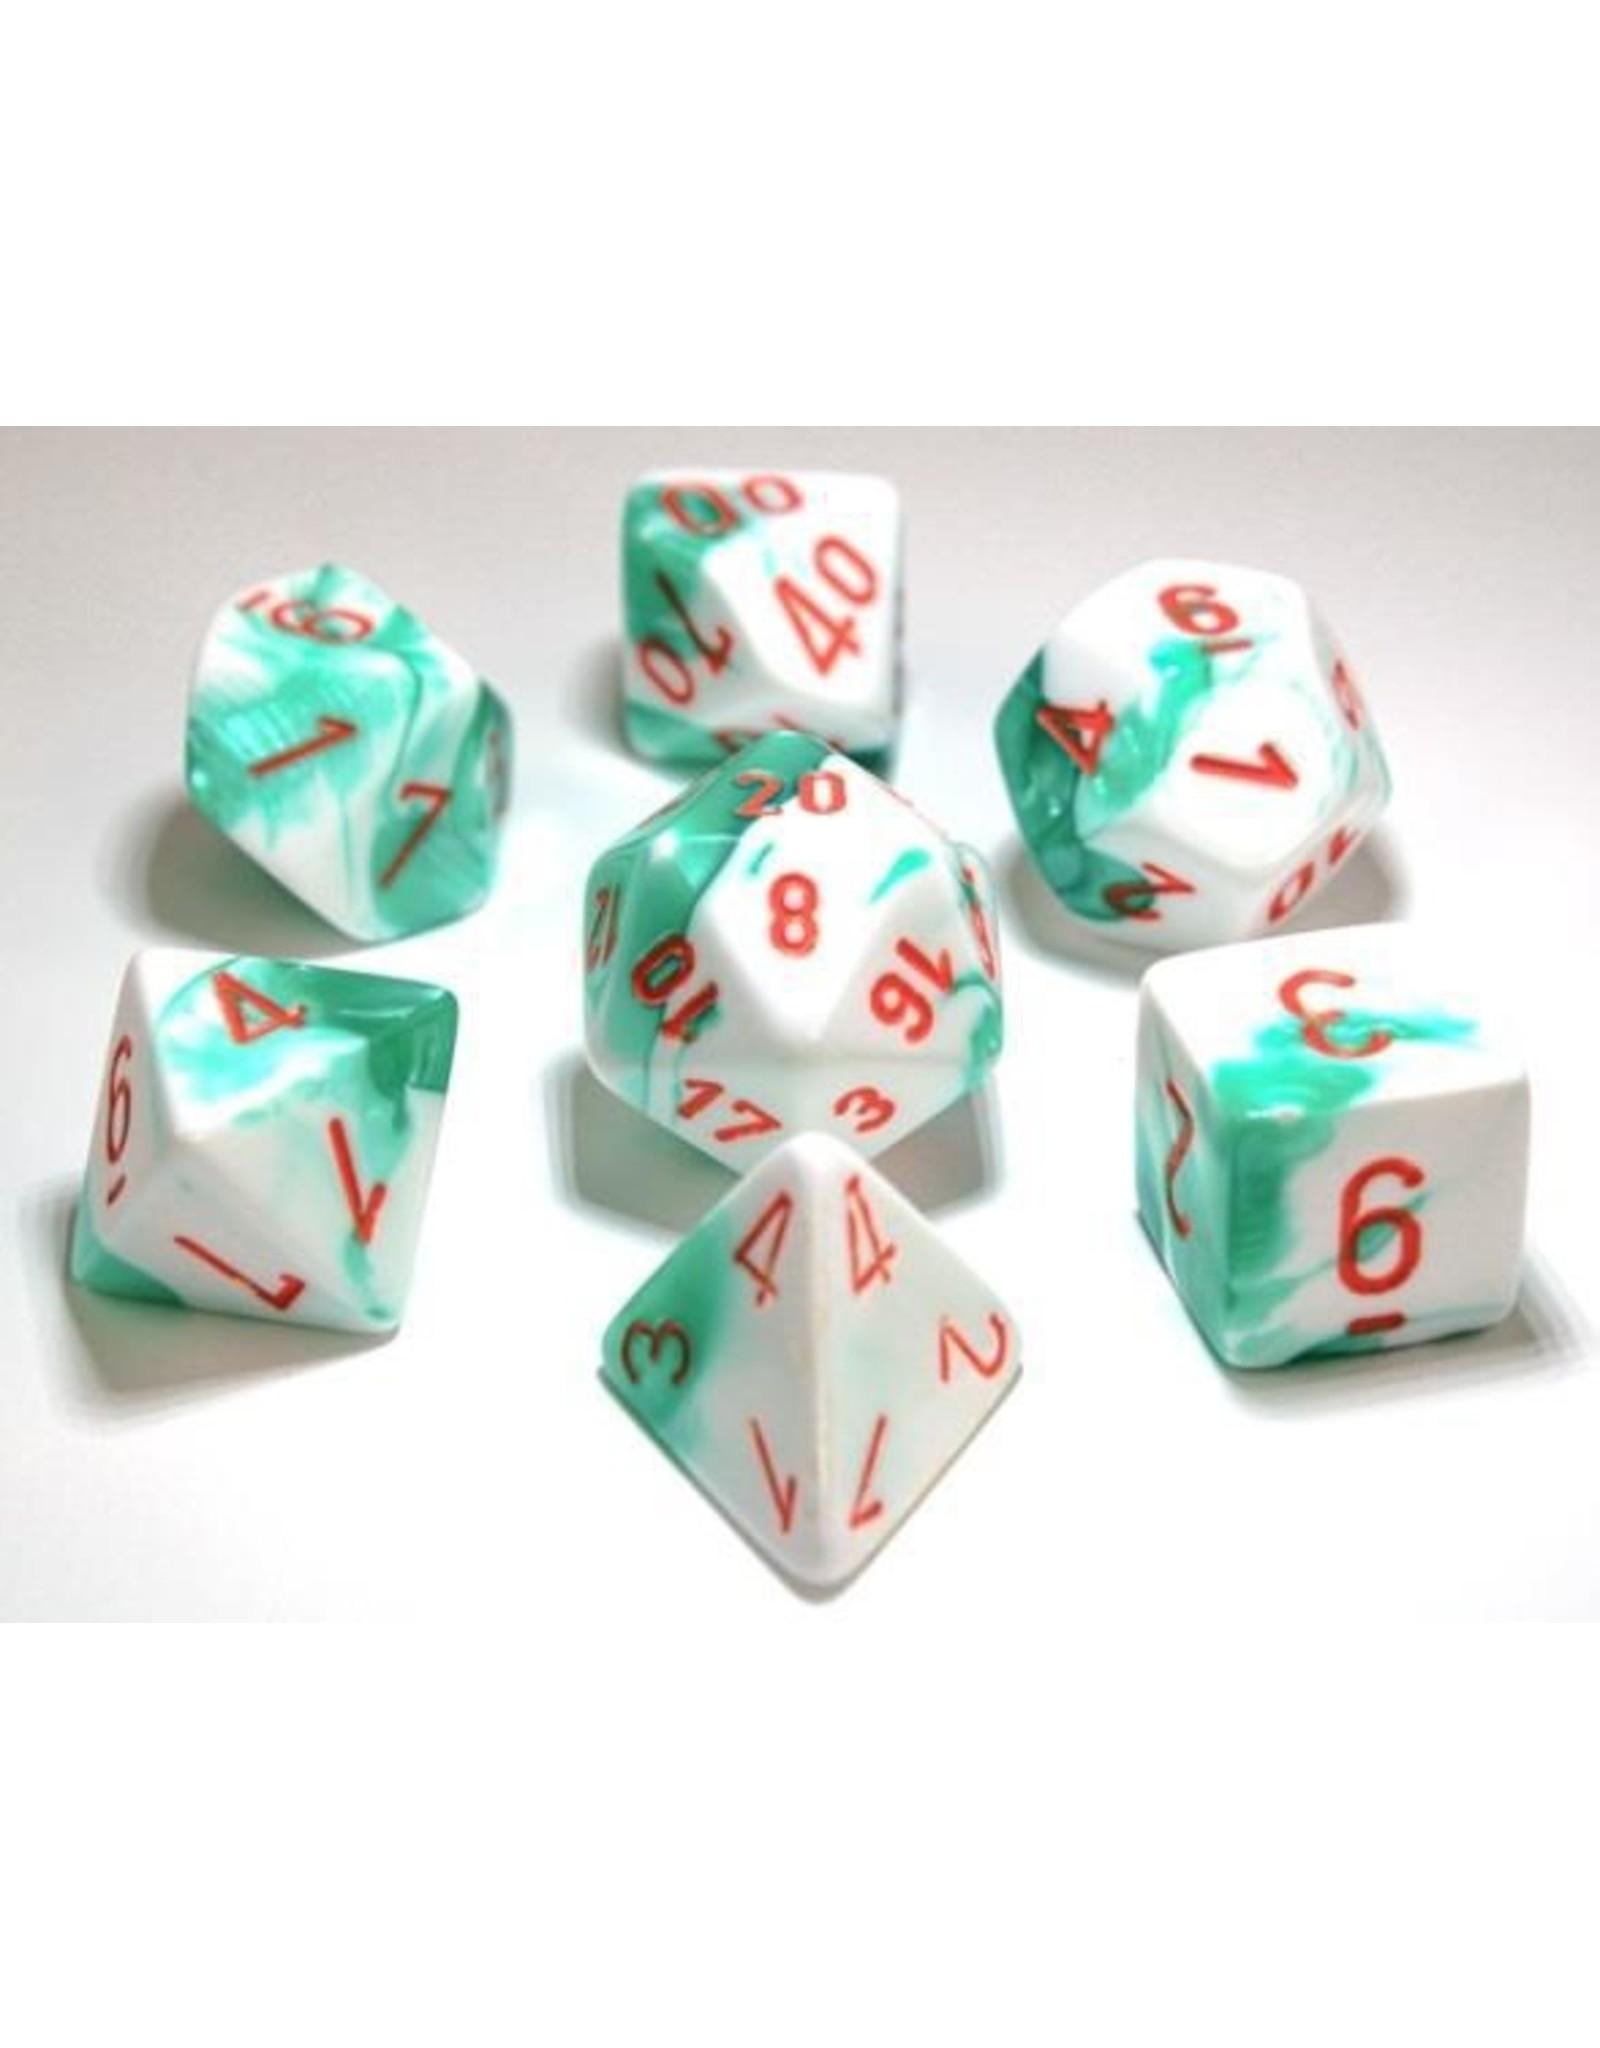 Chessex 7-Set Polyhedral Cube Lab Dice Gemini Mint GRWHor